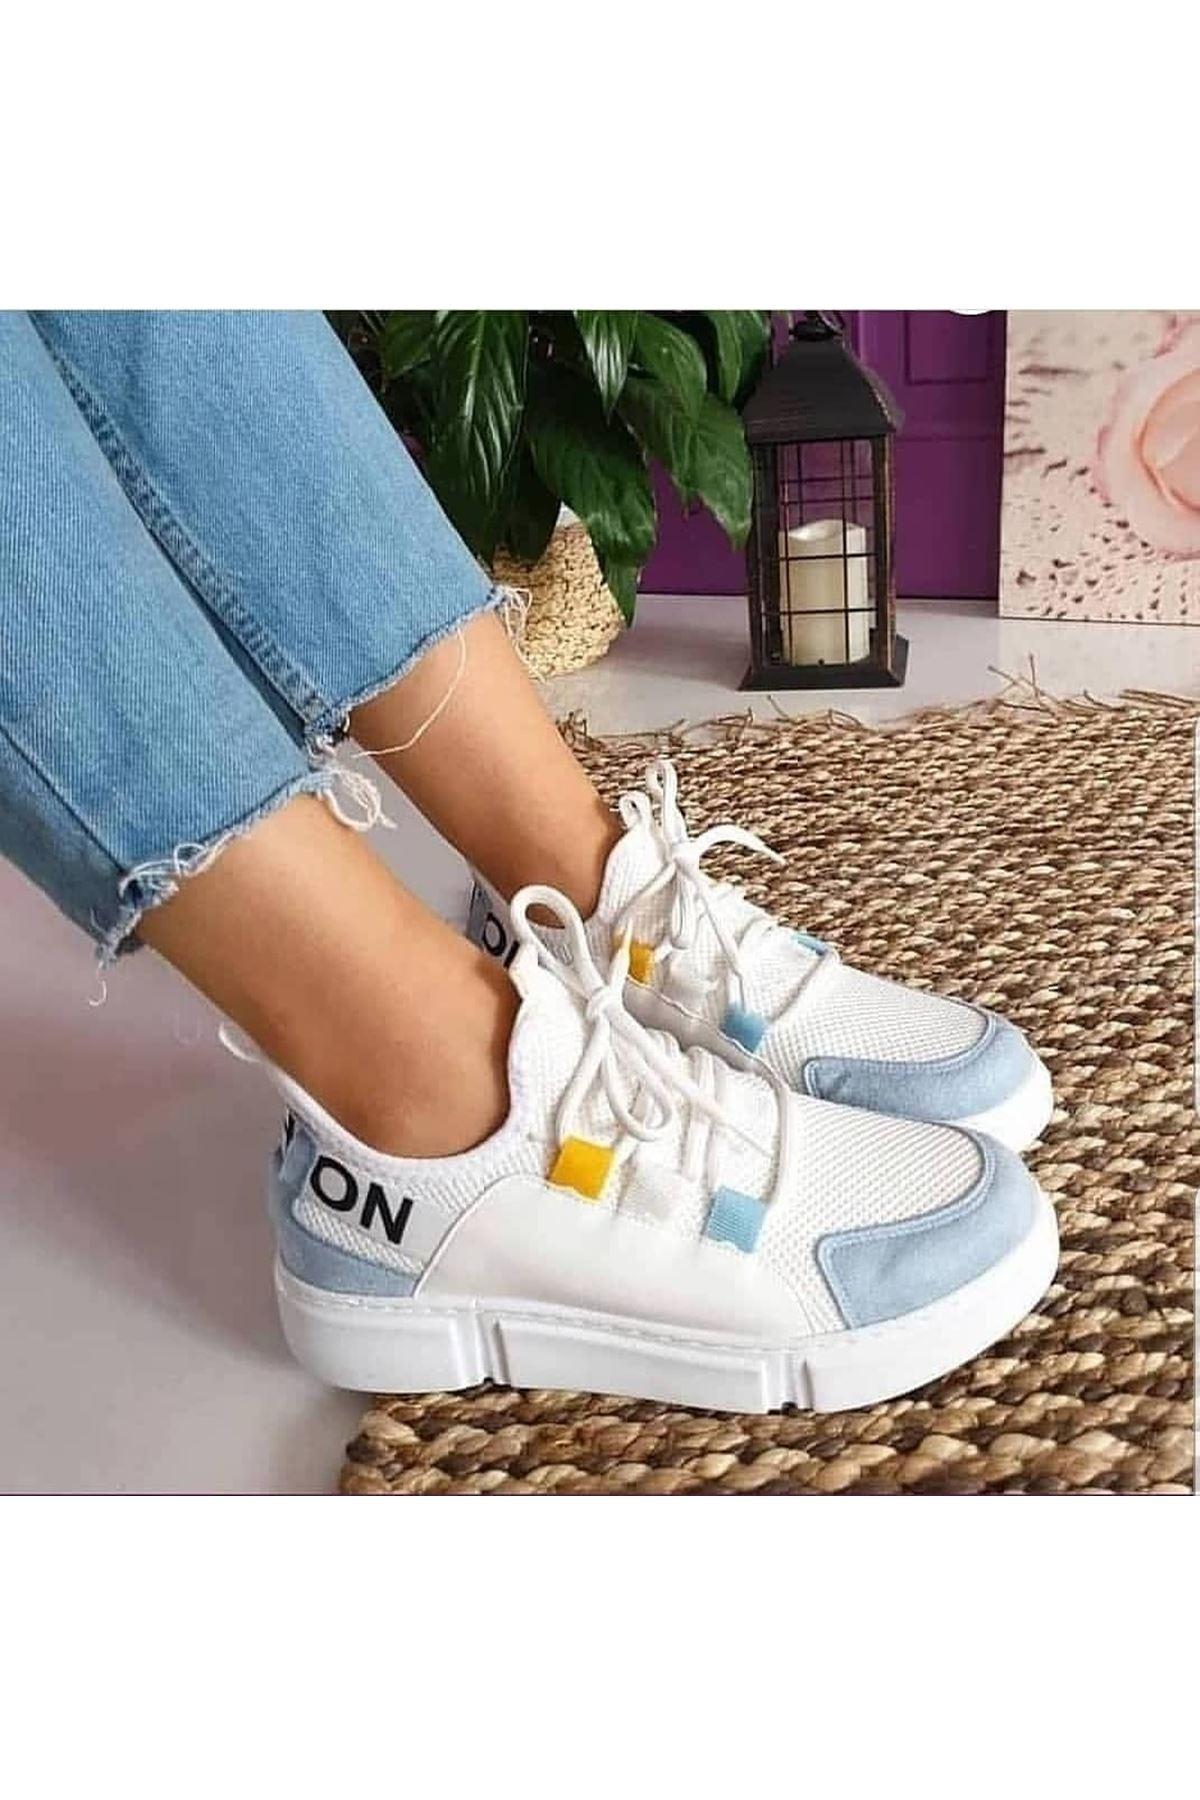 Fashion Yazı Detay Bayan Spor Ayakkabı Bebe Mavi